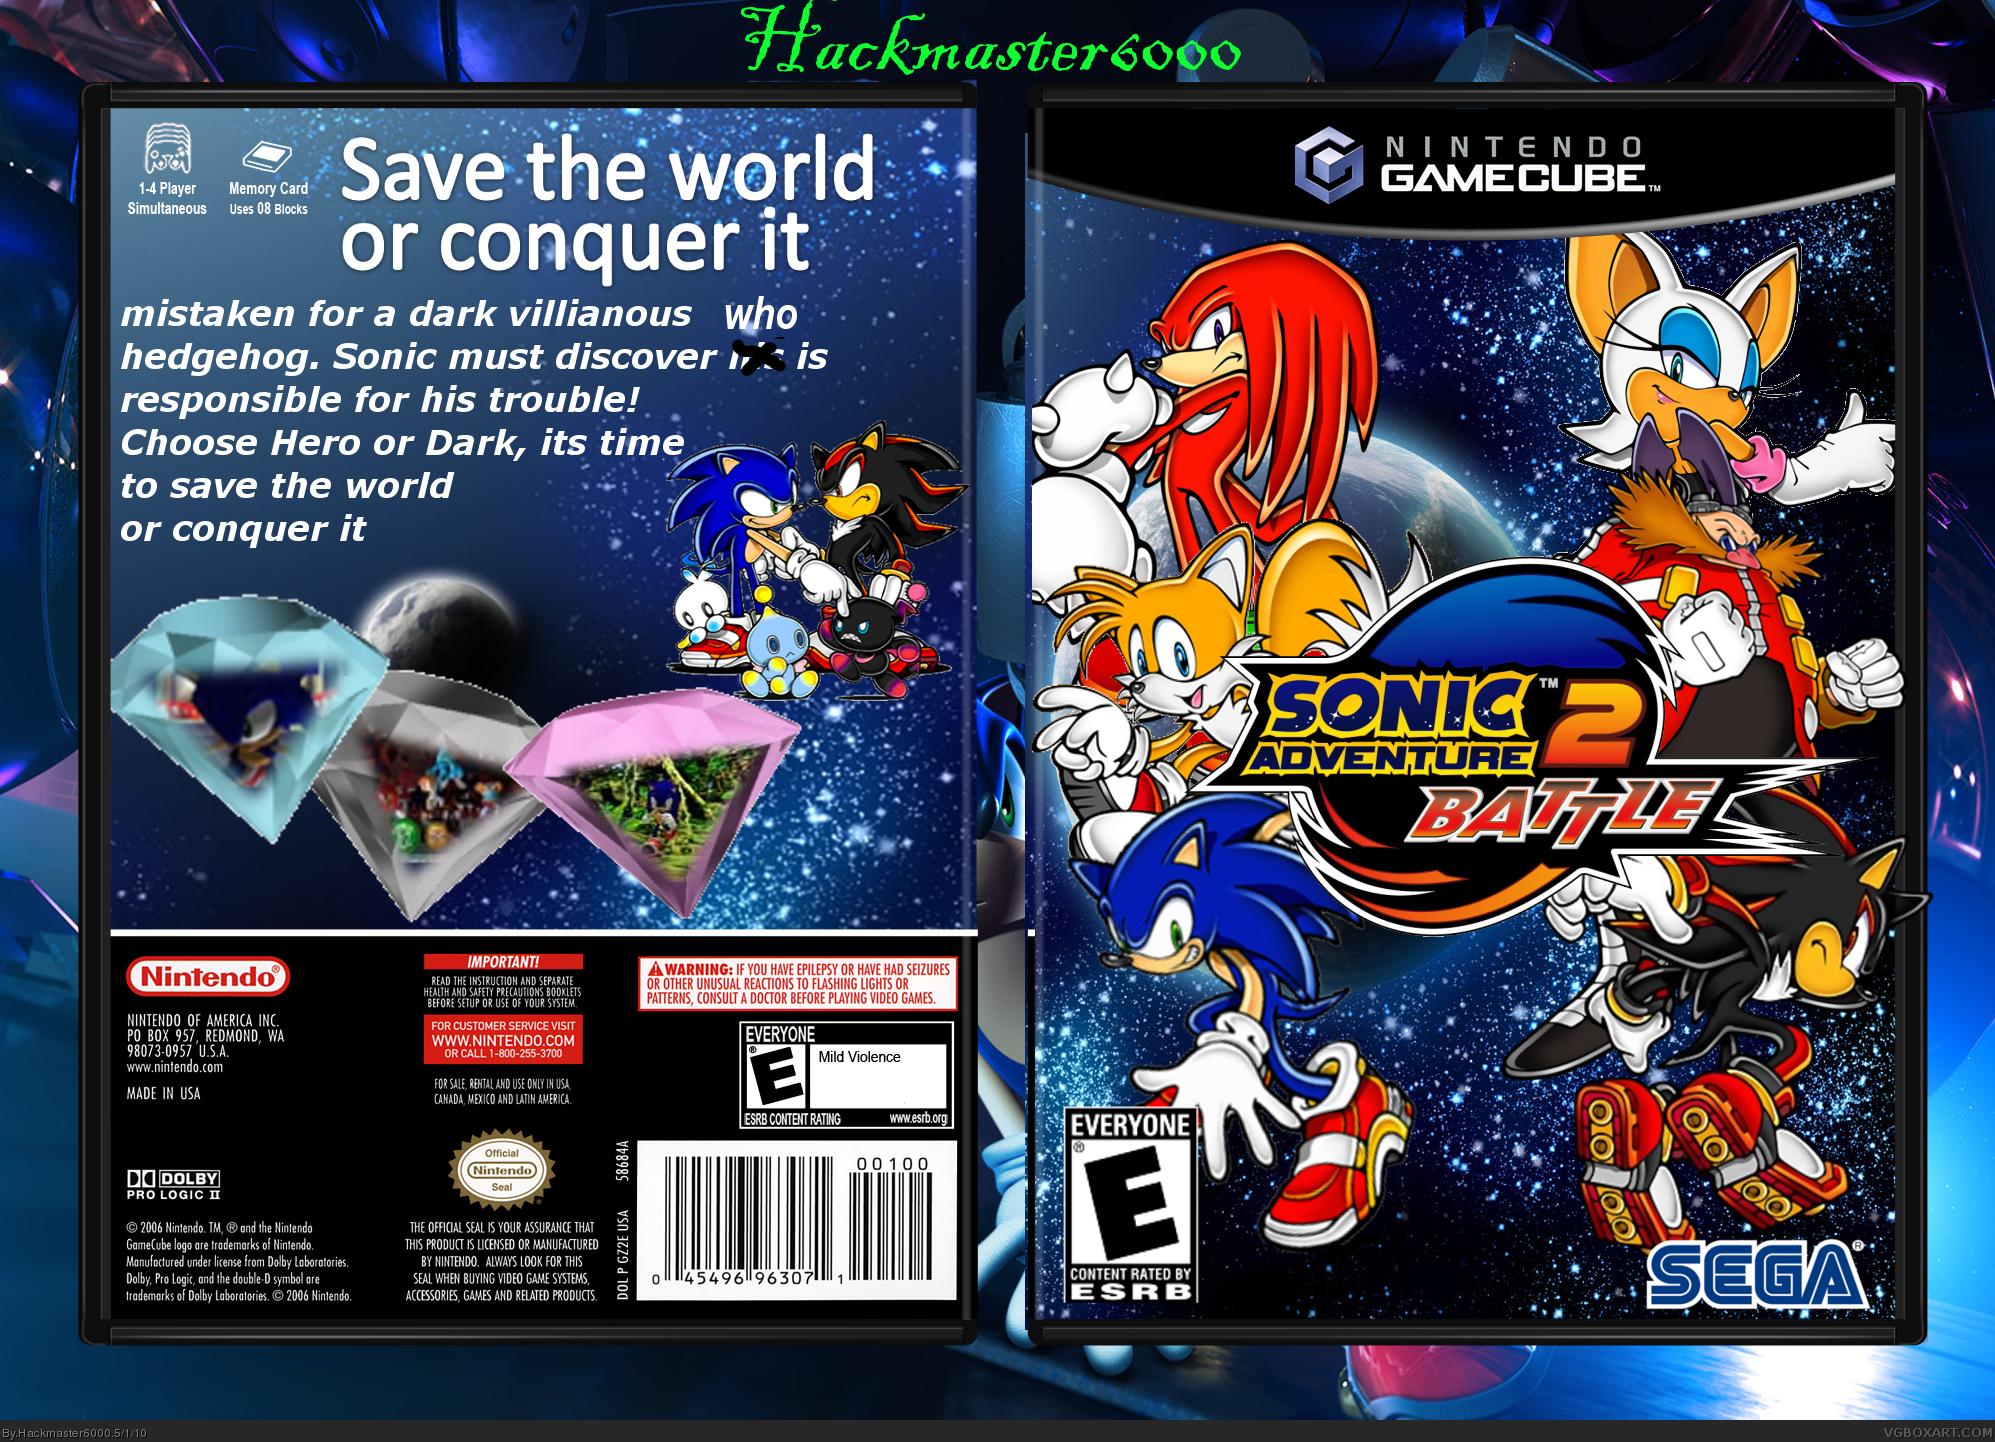 Sonic Adventure 2 Battle Gamecube Box Art Cover By